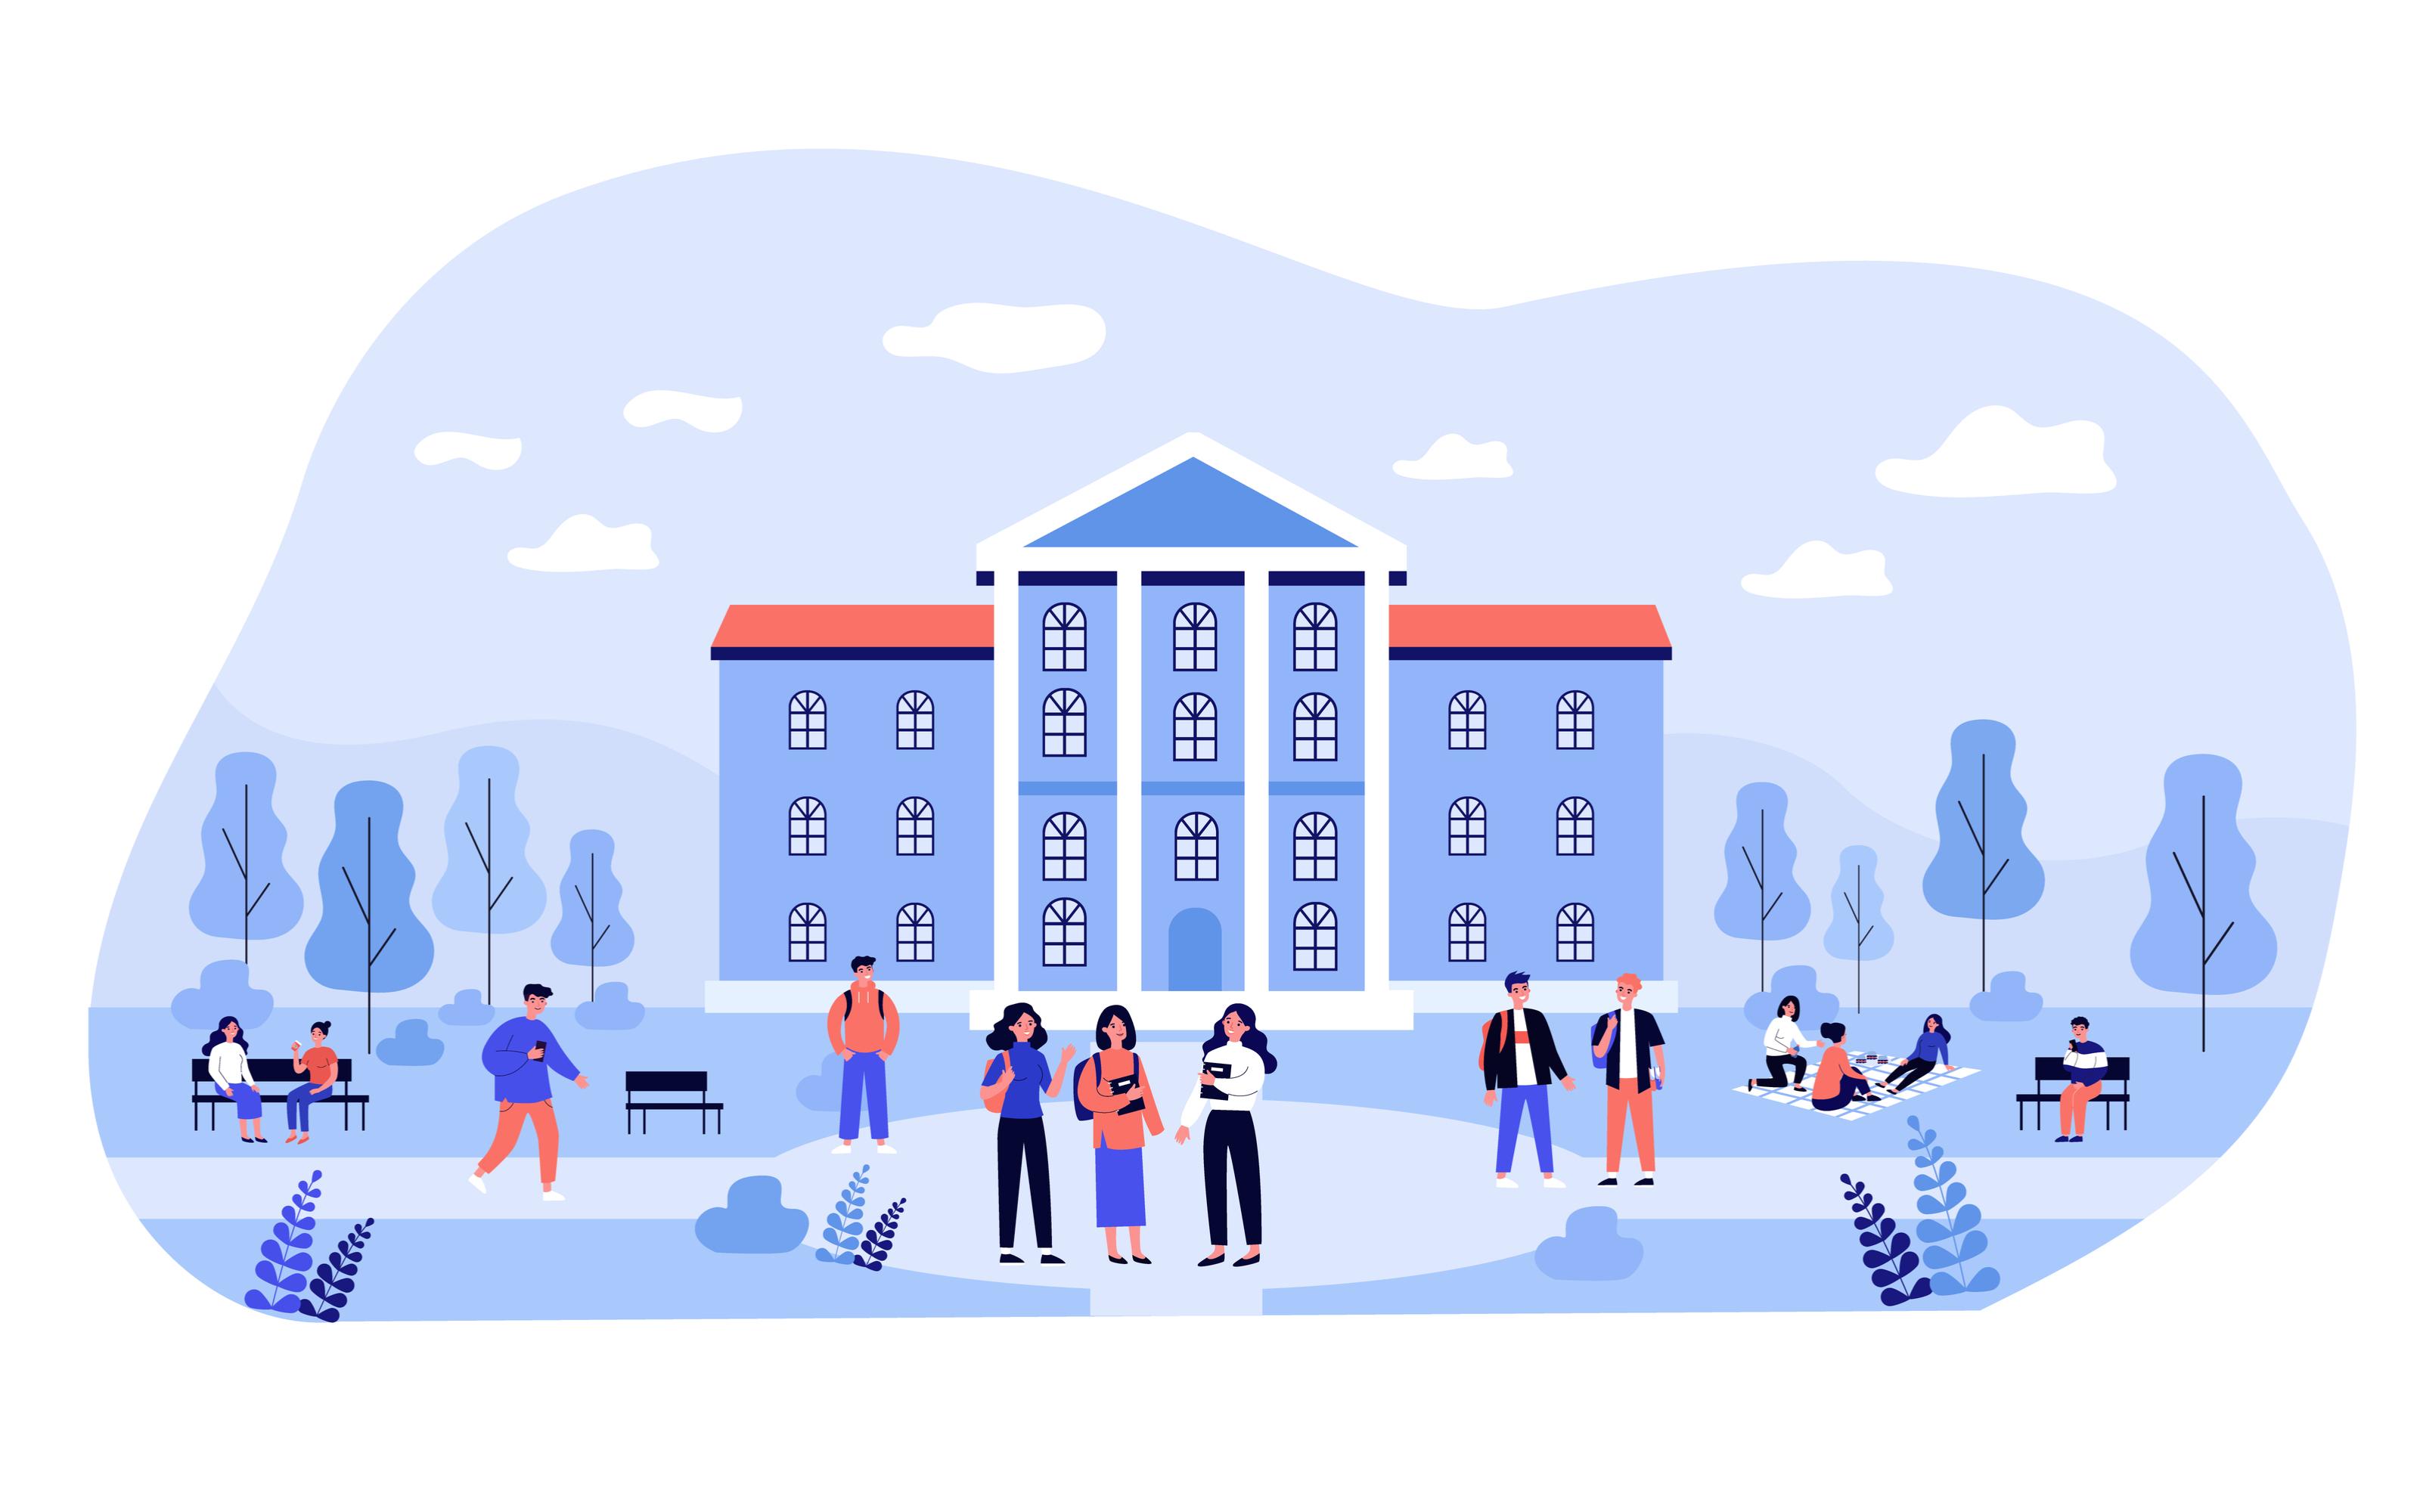 Higher education rankings university 2021